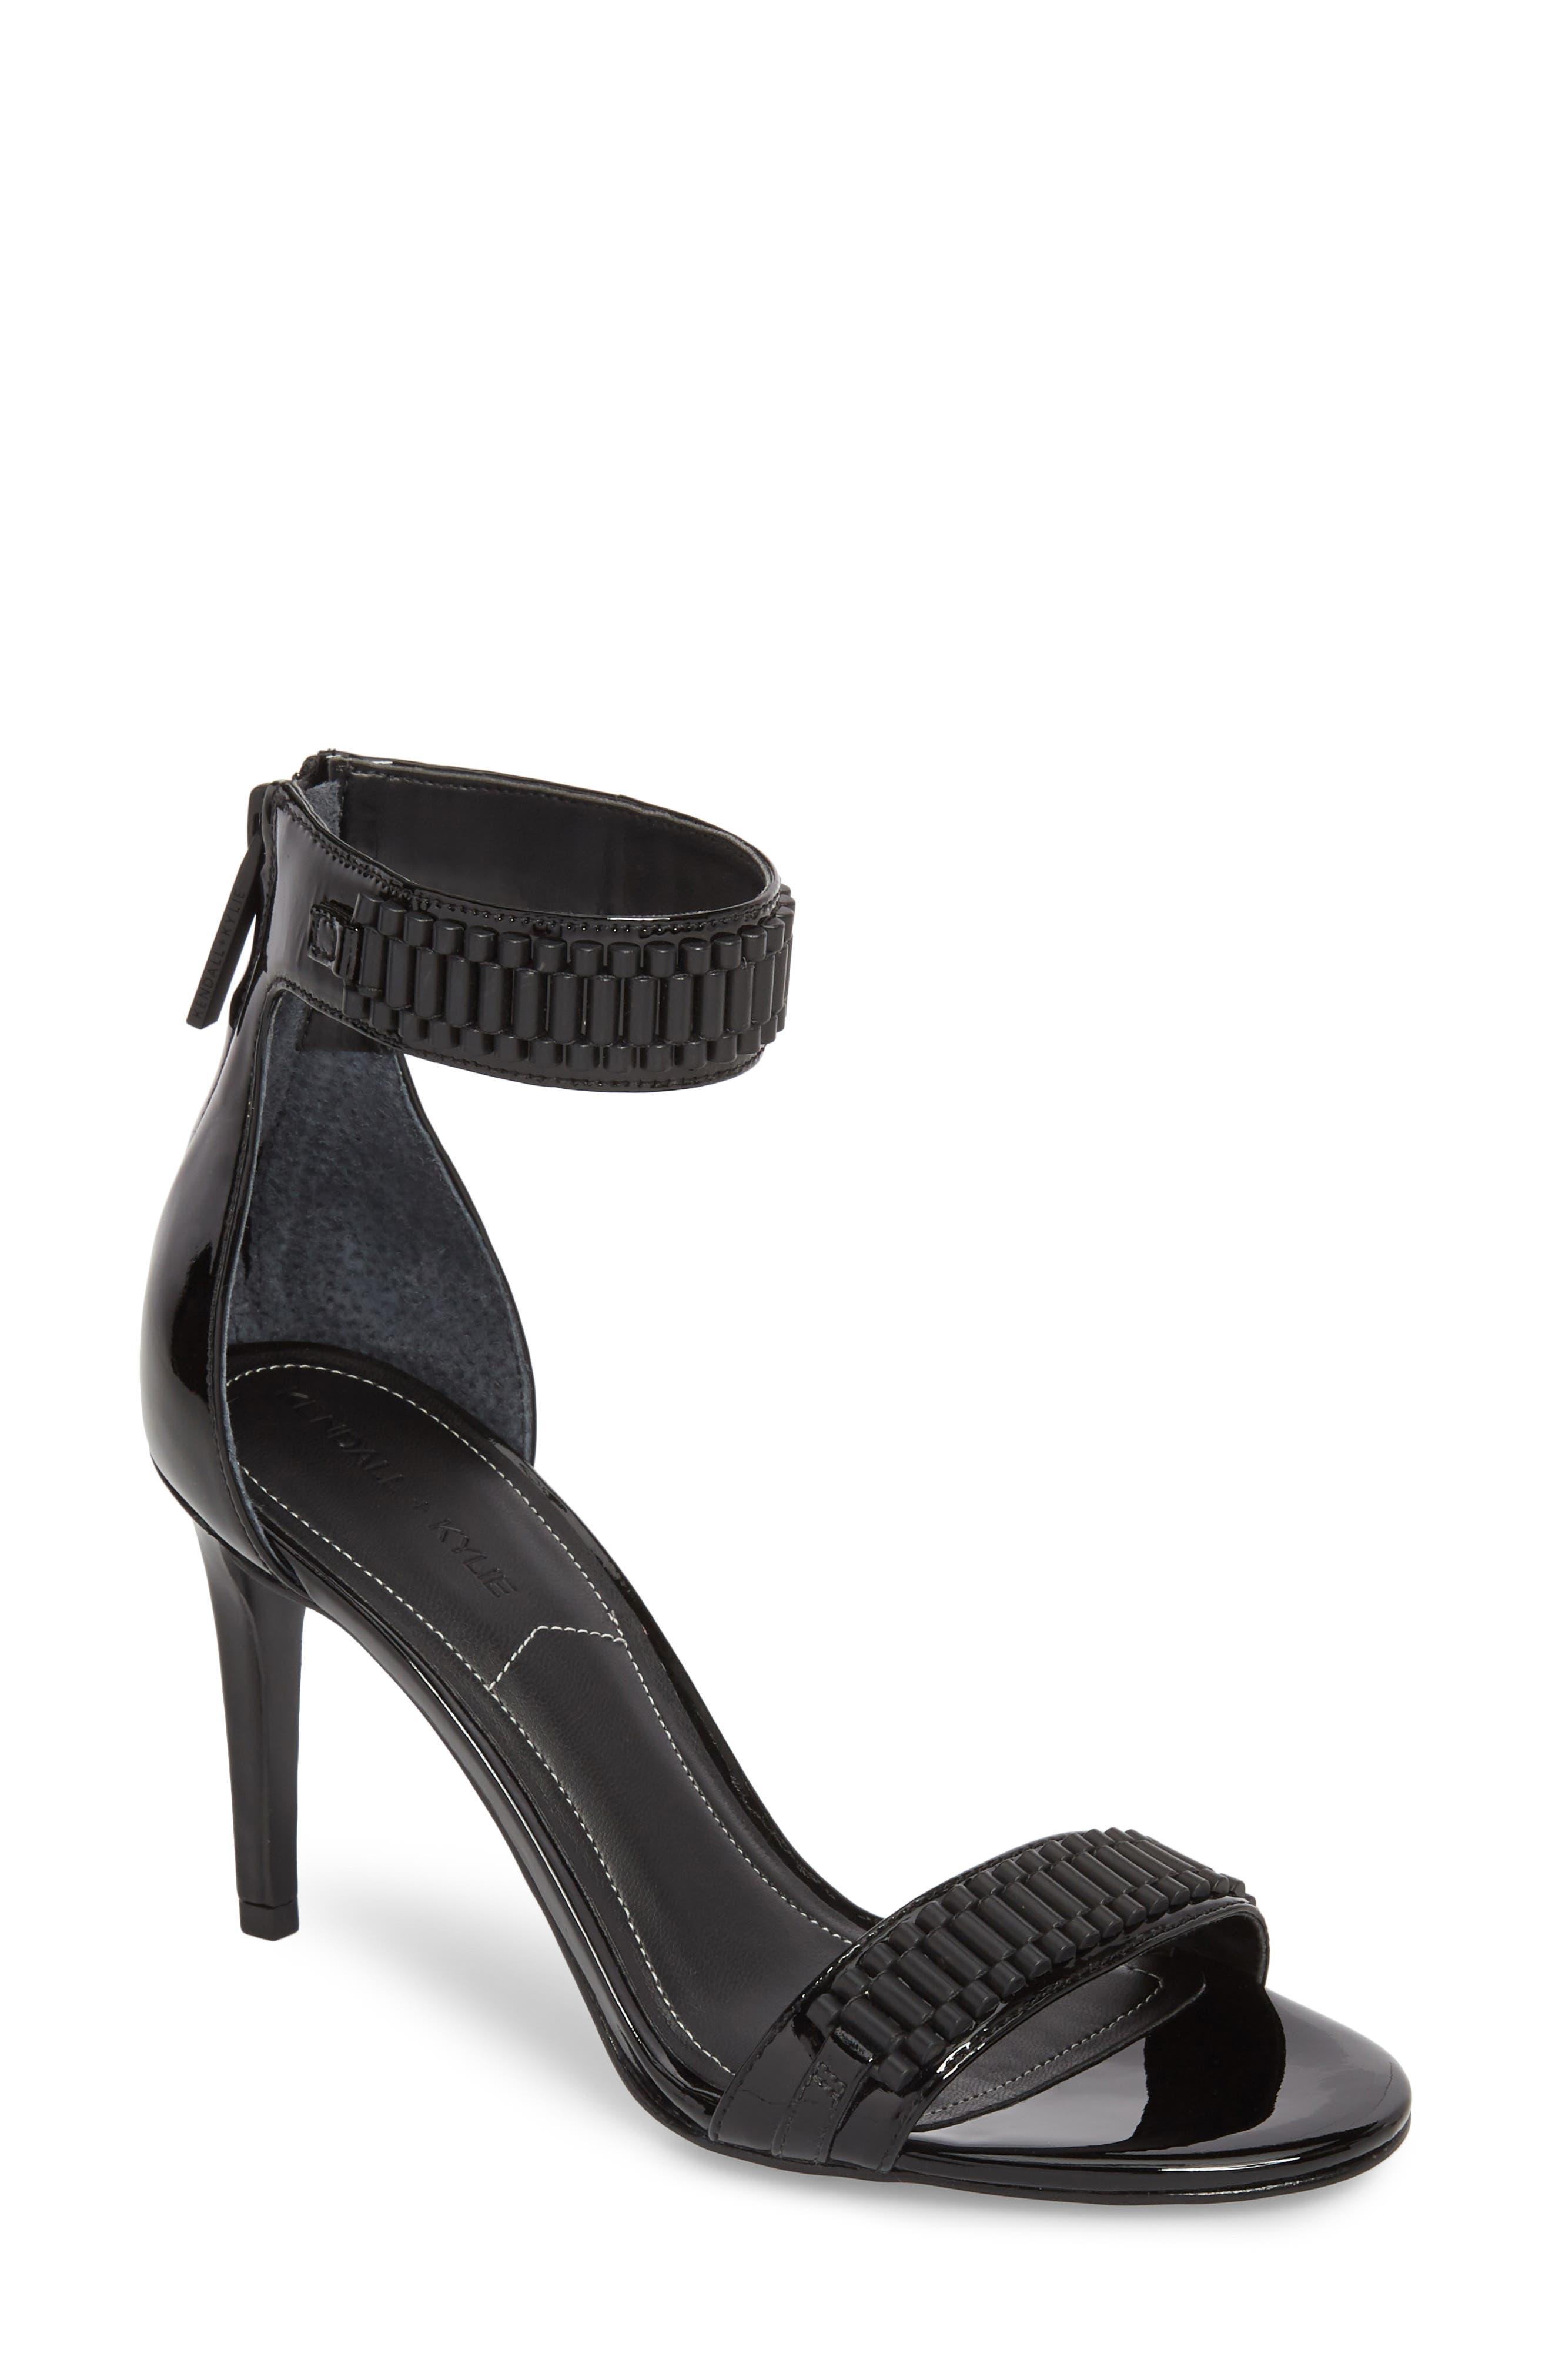 Miaa Beaded Sandal,                             Main thumbnail 1, color,                             Black/ Black